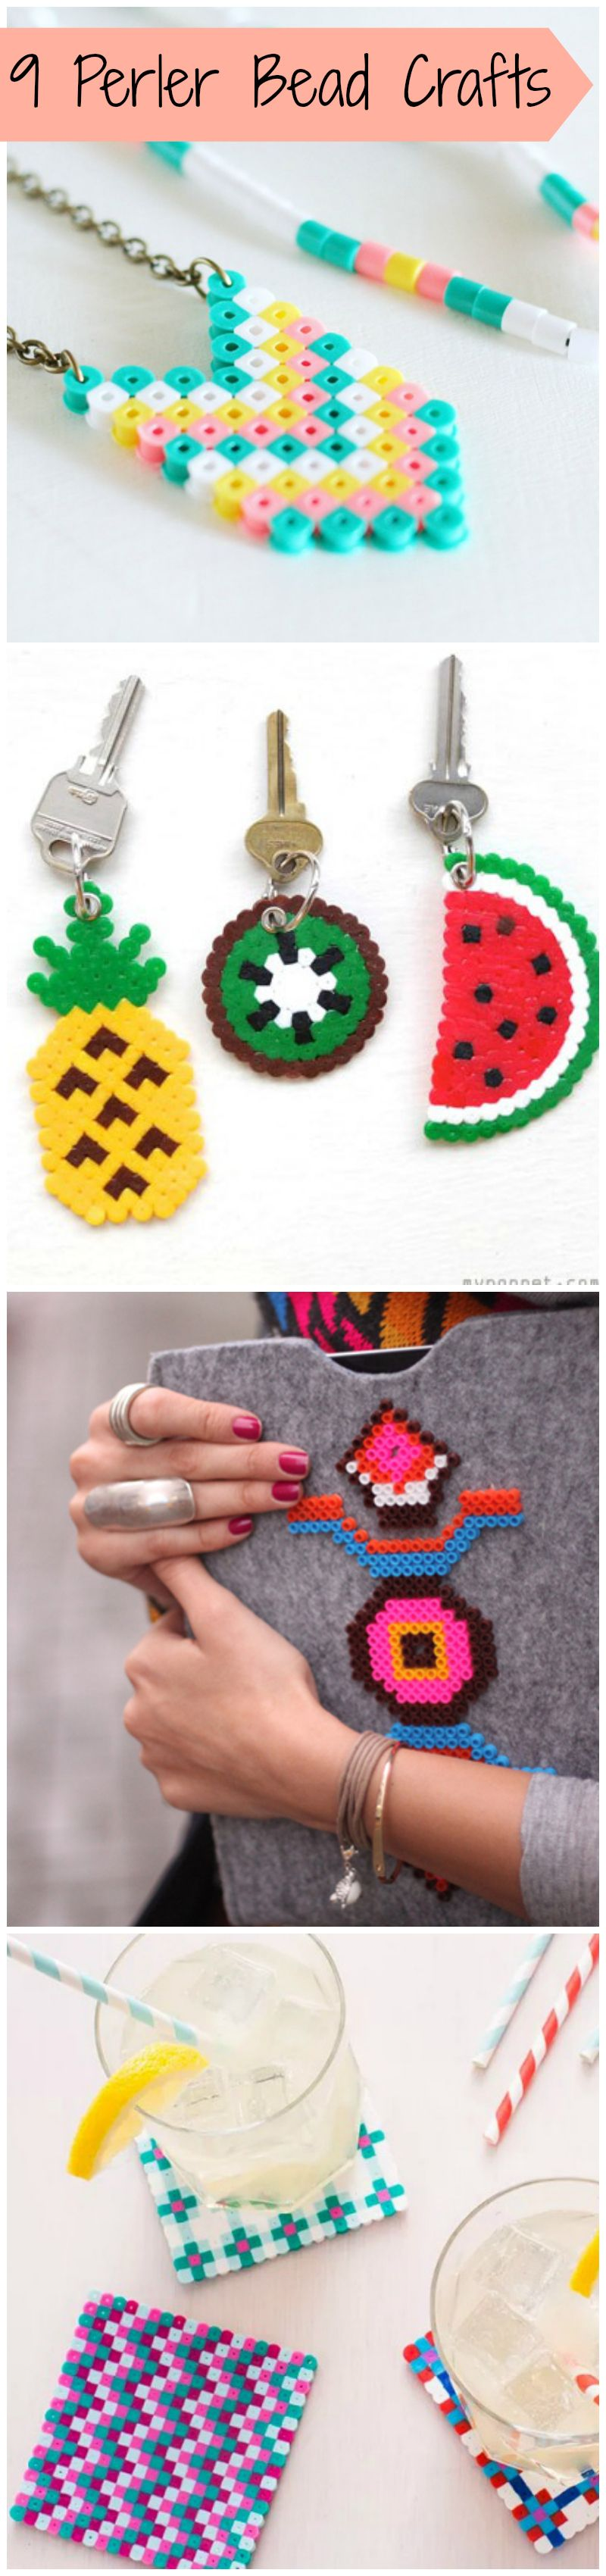 9 Crafts That Make Us Totally Nostalgic For Perler Beads Bead Crafts Iron Beads Bead Art